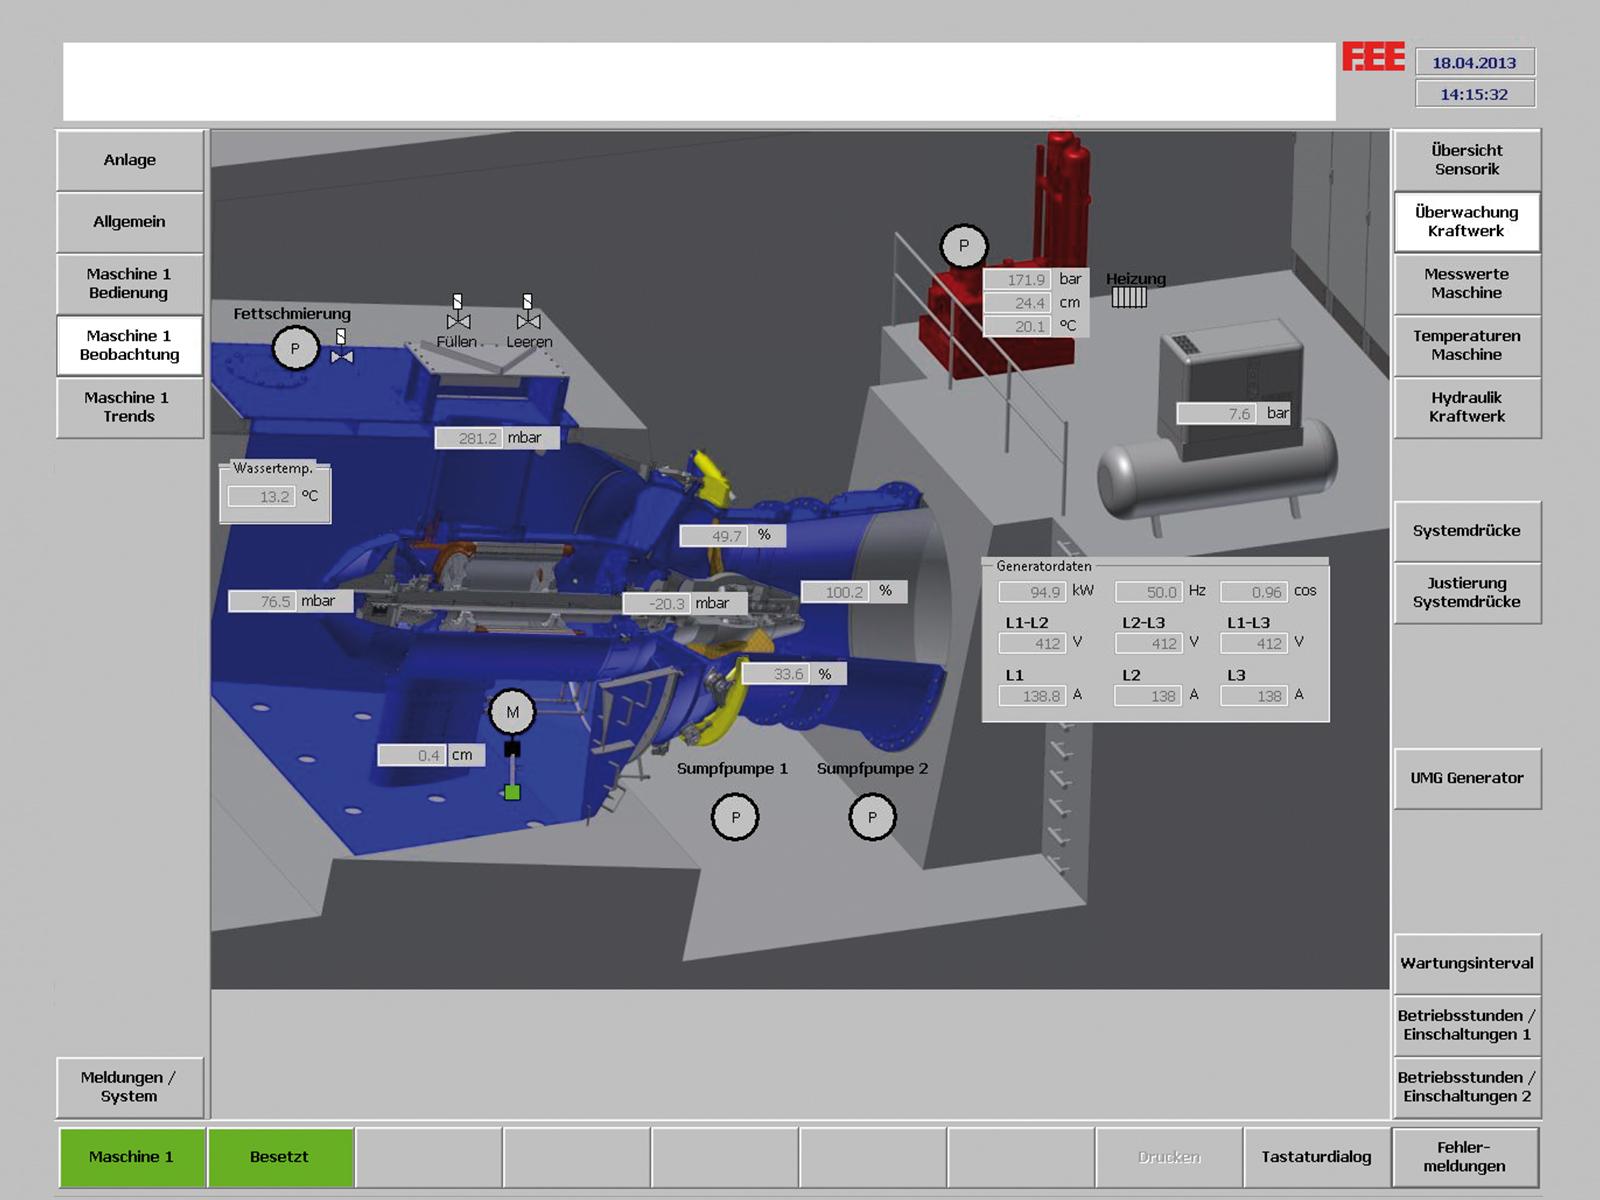 Visualisation And Control Technology F Ee Partner Fur Automation Schaltschrankbau Hardwareplanung Energietechnik